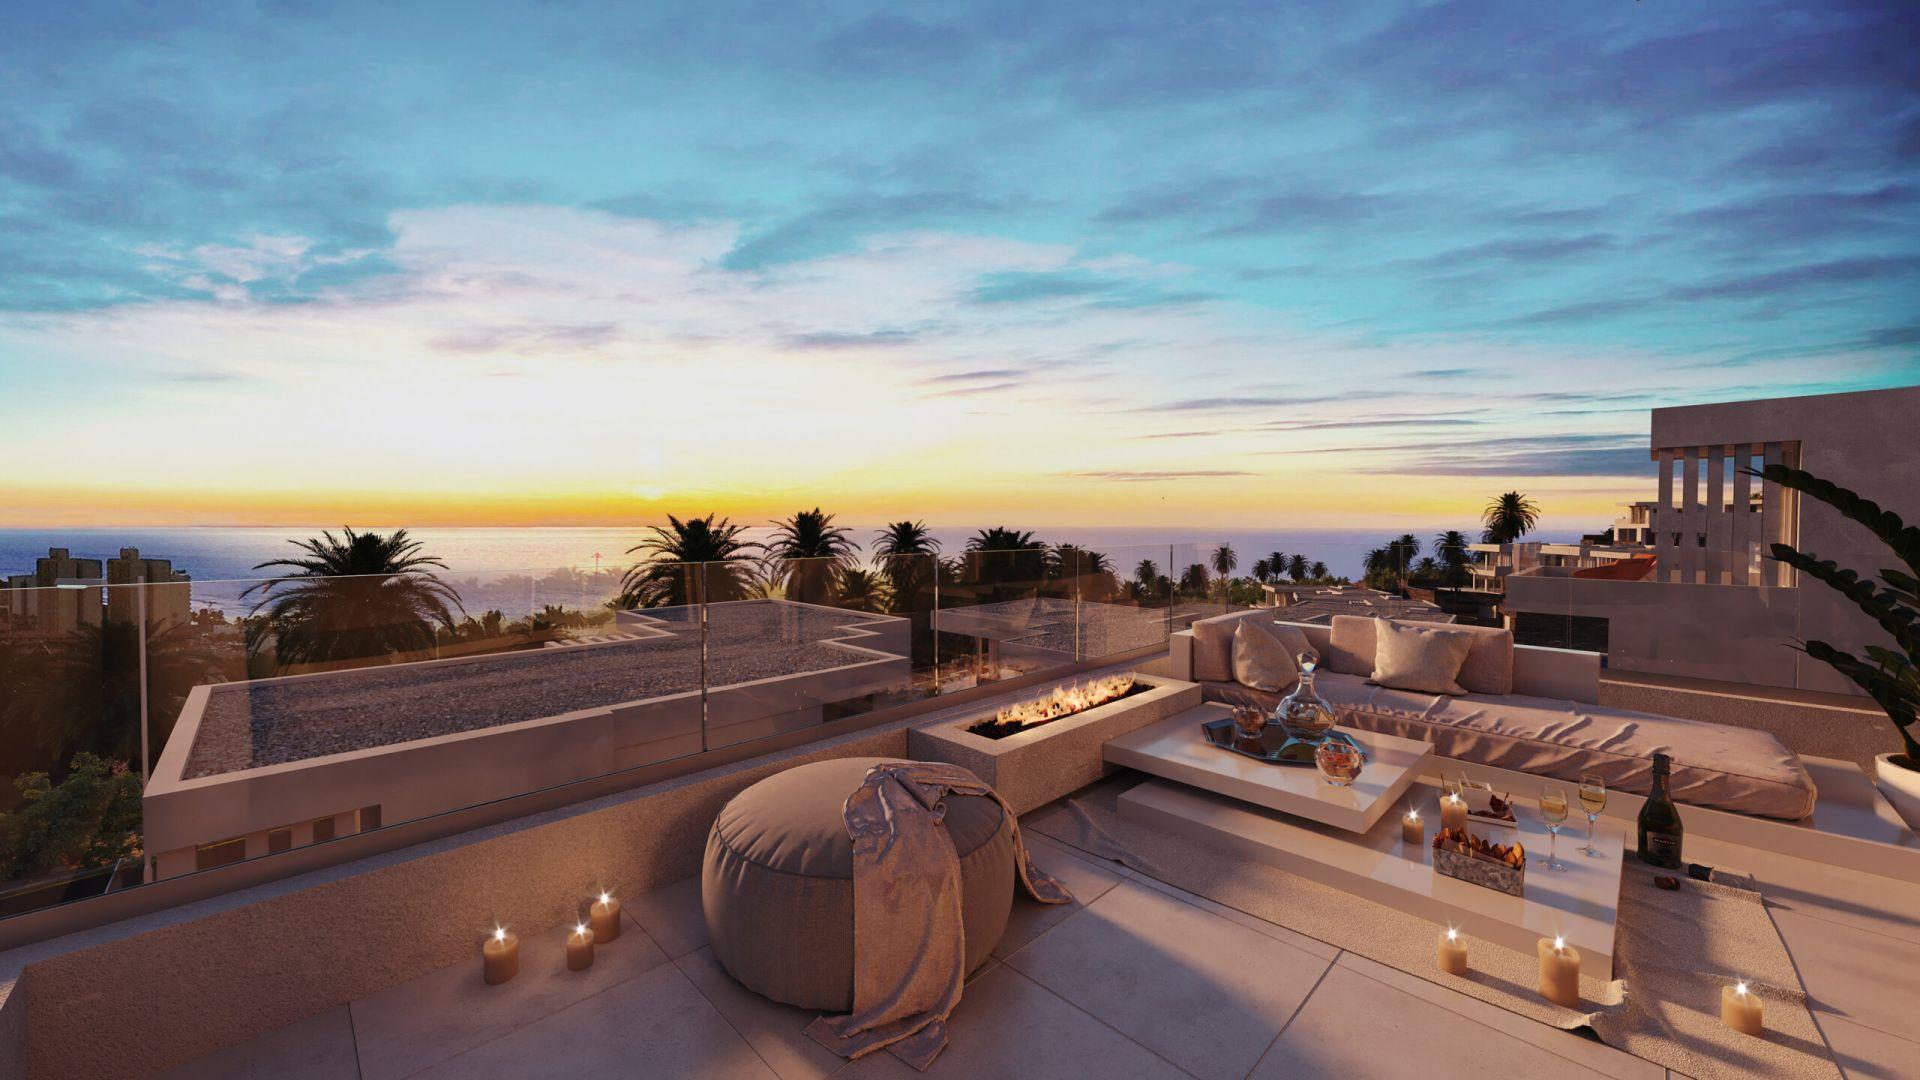 Serenity Luxury Villas Tenerife - img 3.